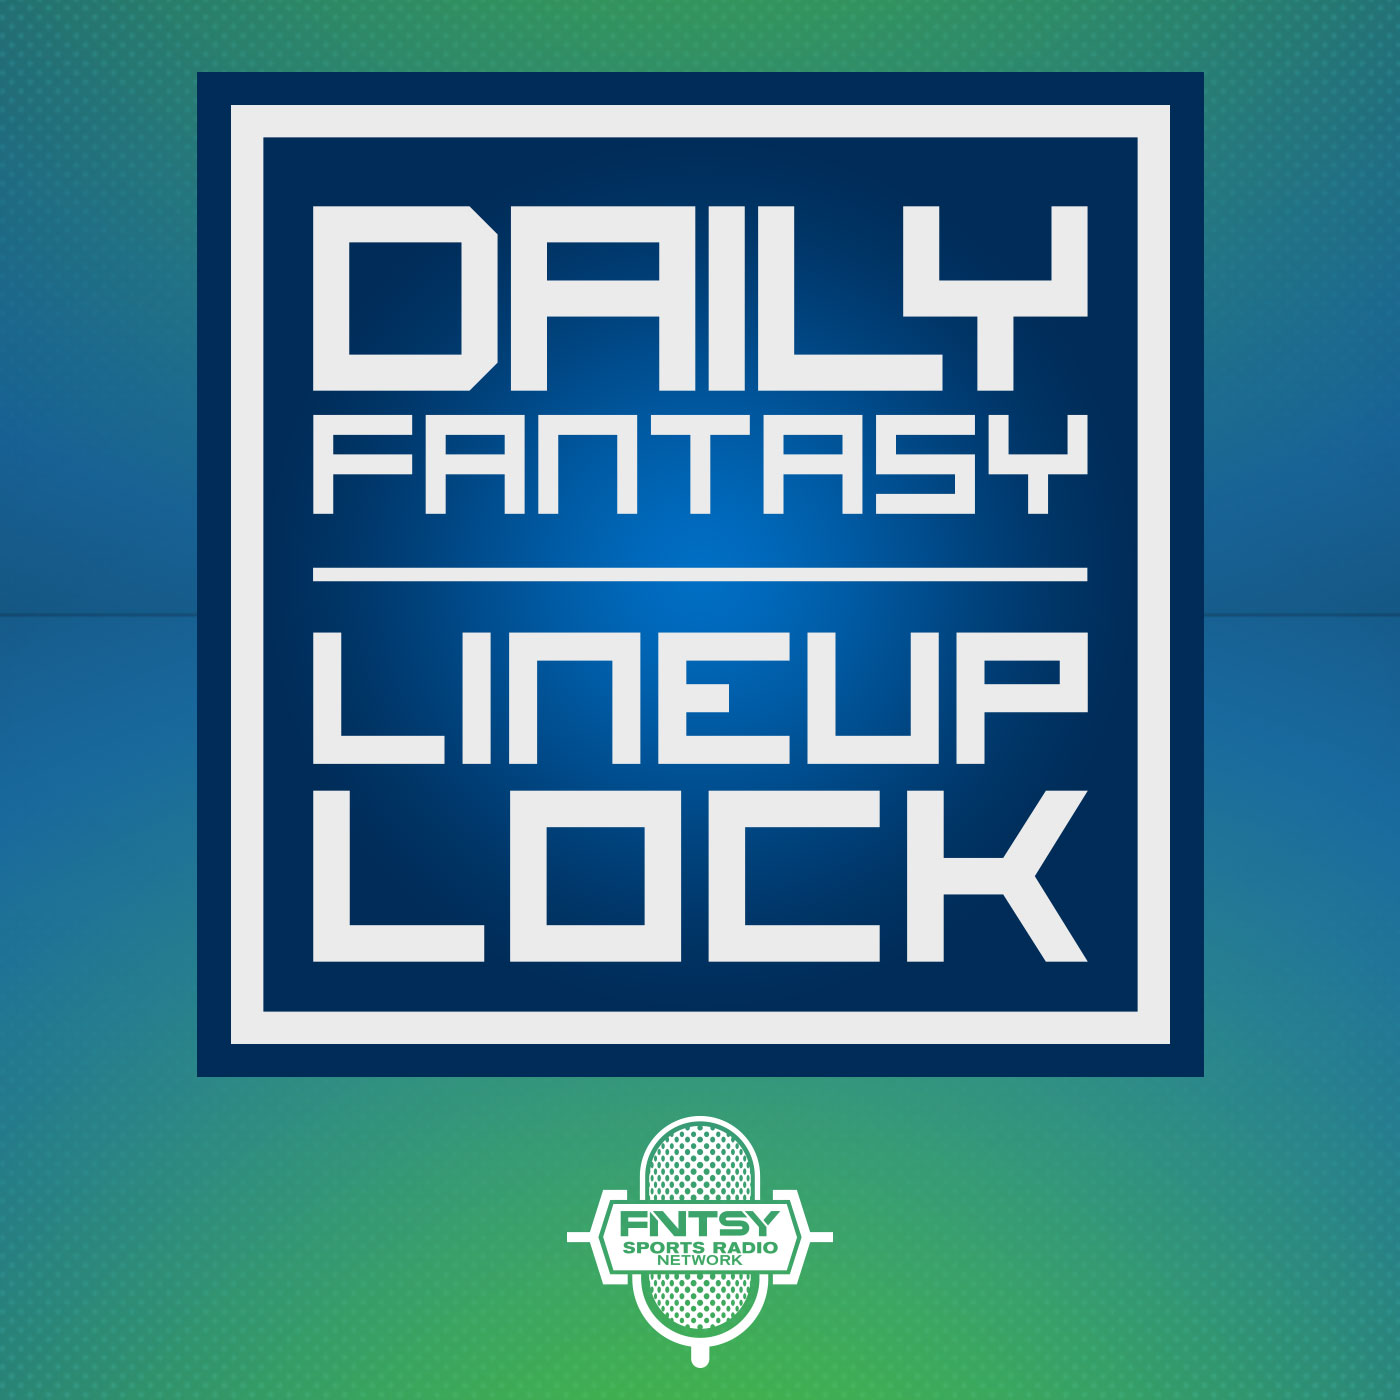 DFS Lineup Lock